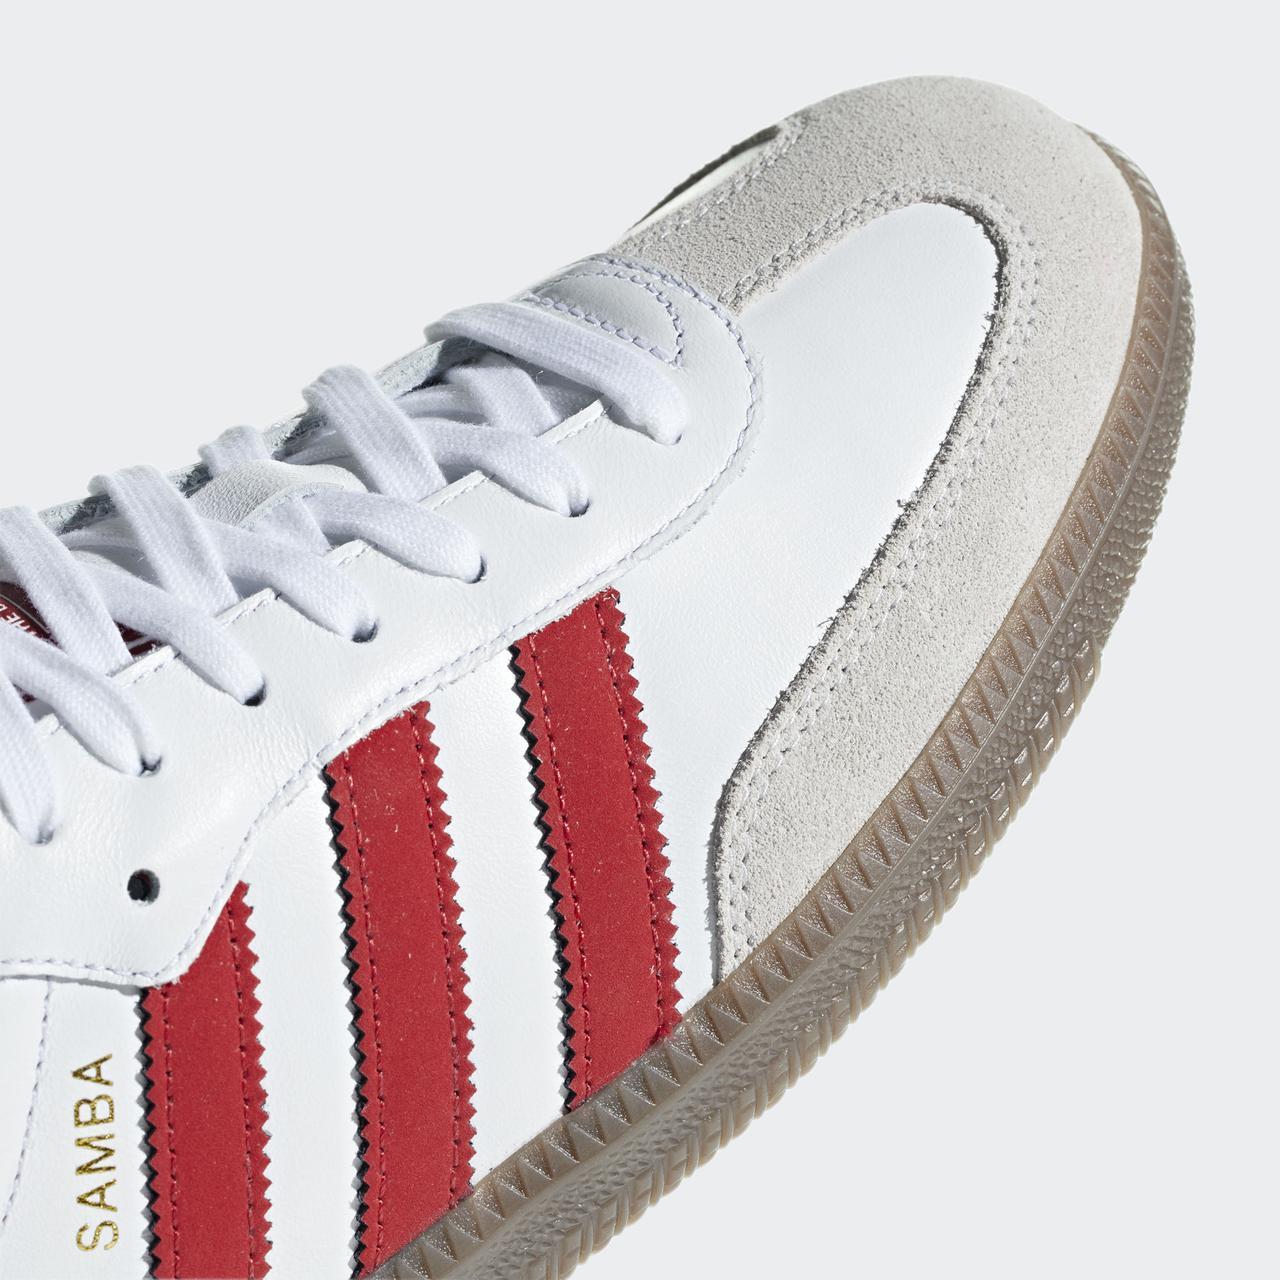 ... Мужские кроссовки Adidas Originals Samba OG (Артикул  B44628), фото 10 7b2ba62adcf